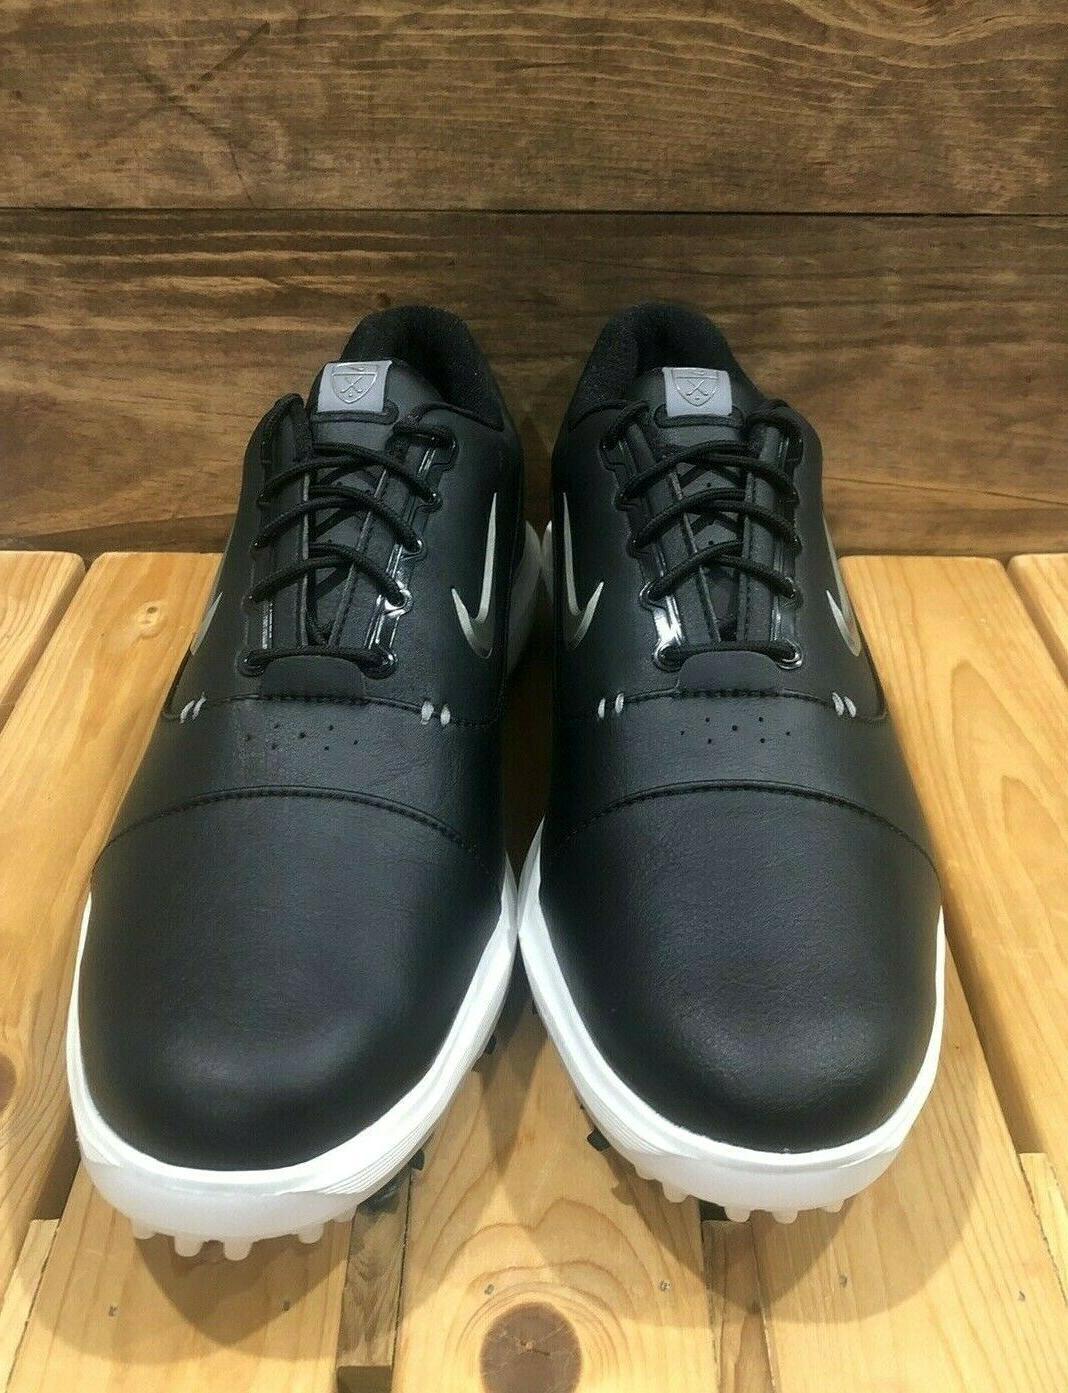 Nike Pro Black White - Men's AR5577-001